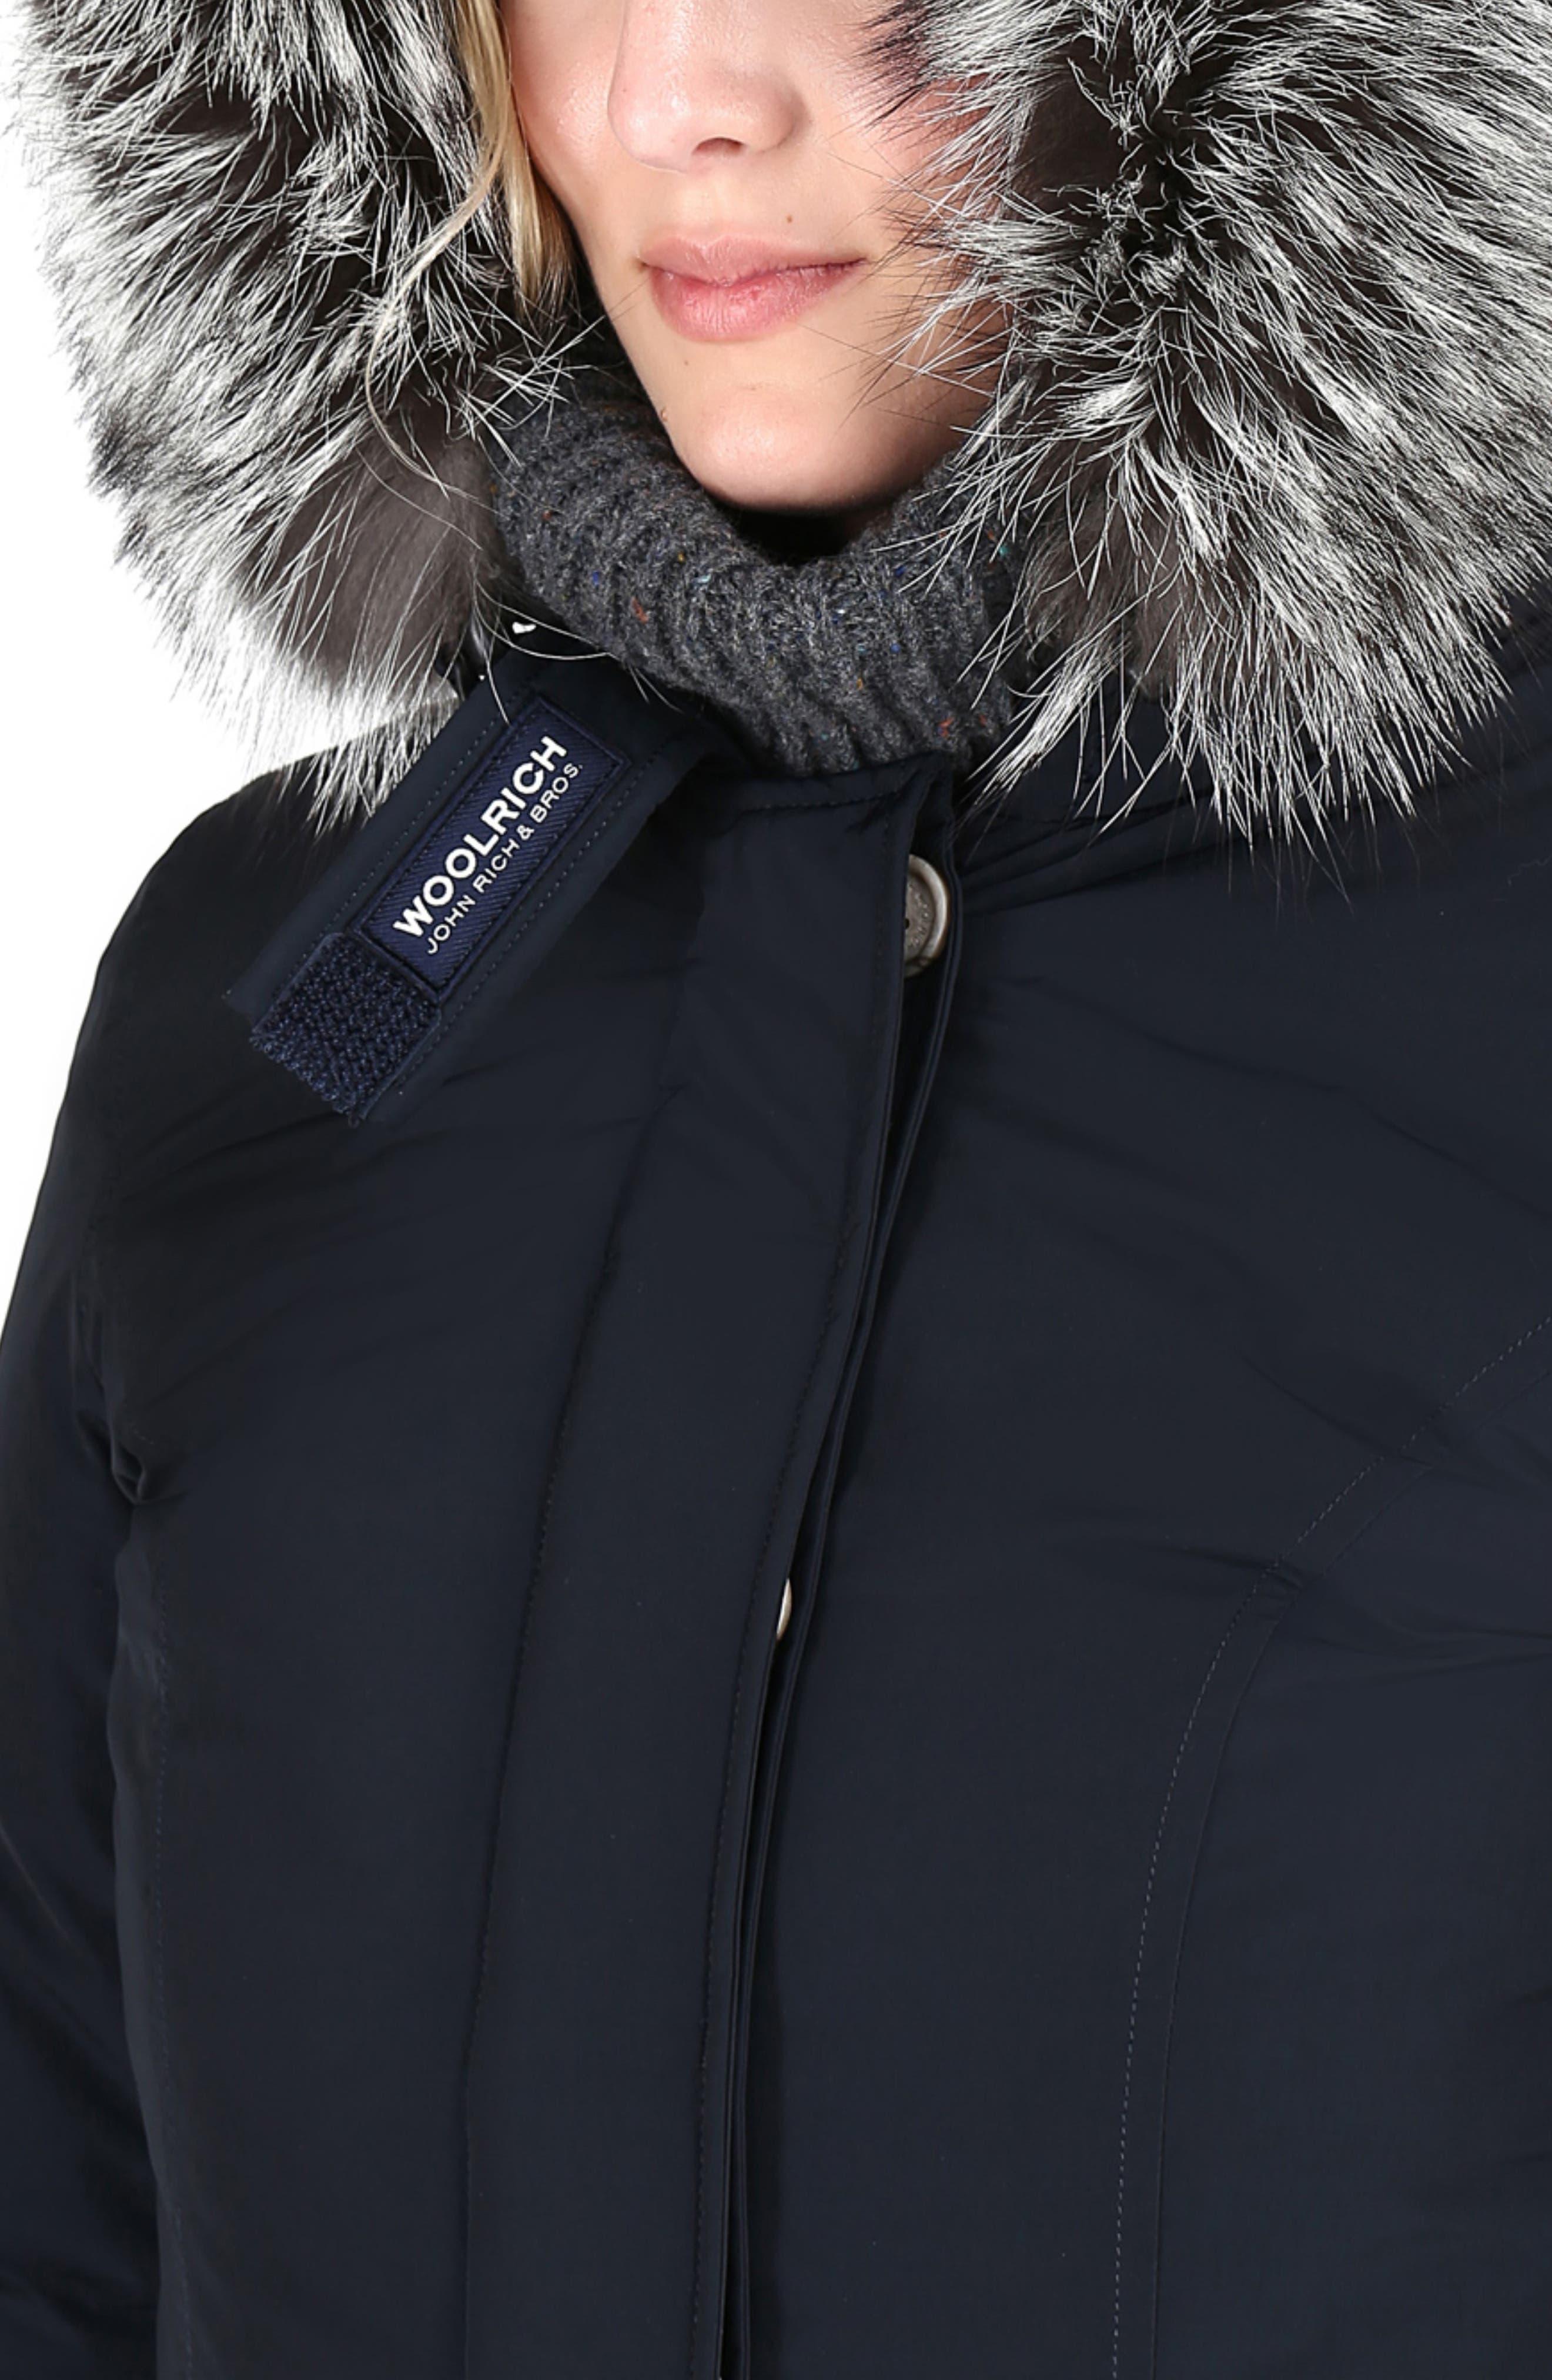 Luxury Arctic Down Parka with Genuine Fox Fur Trim,                             Alternate thumbnail 4, color,                             MIDNIGHT BLUE